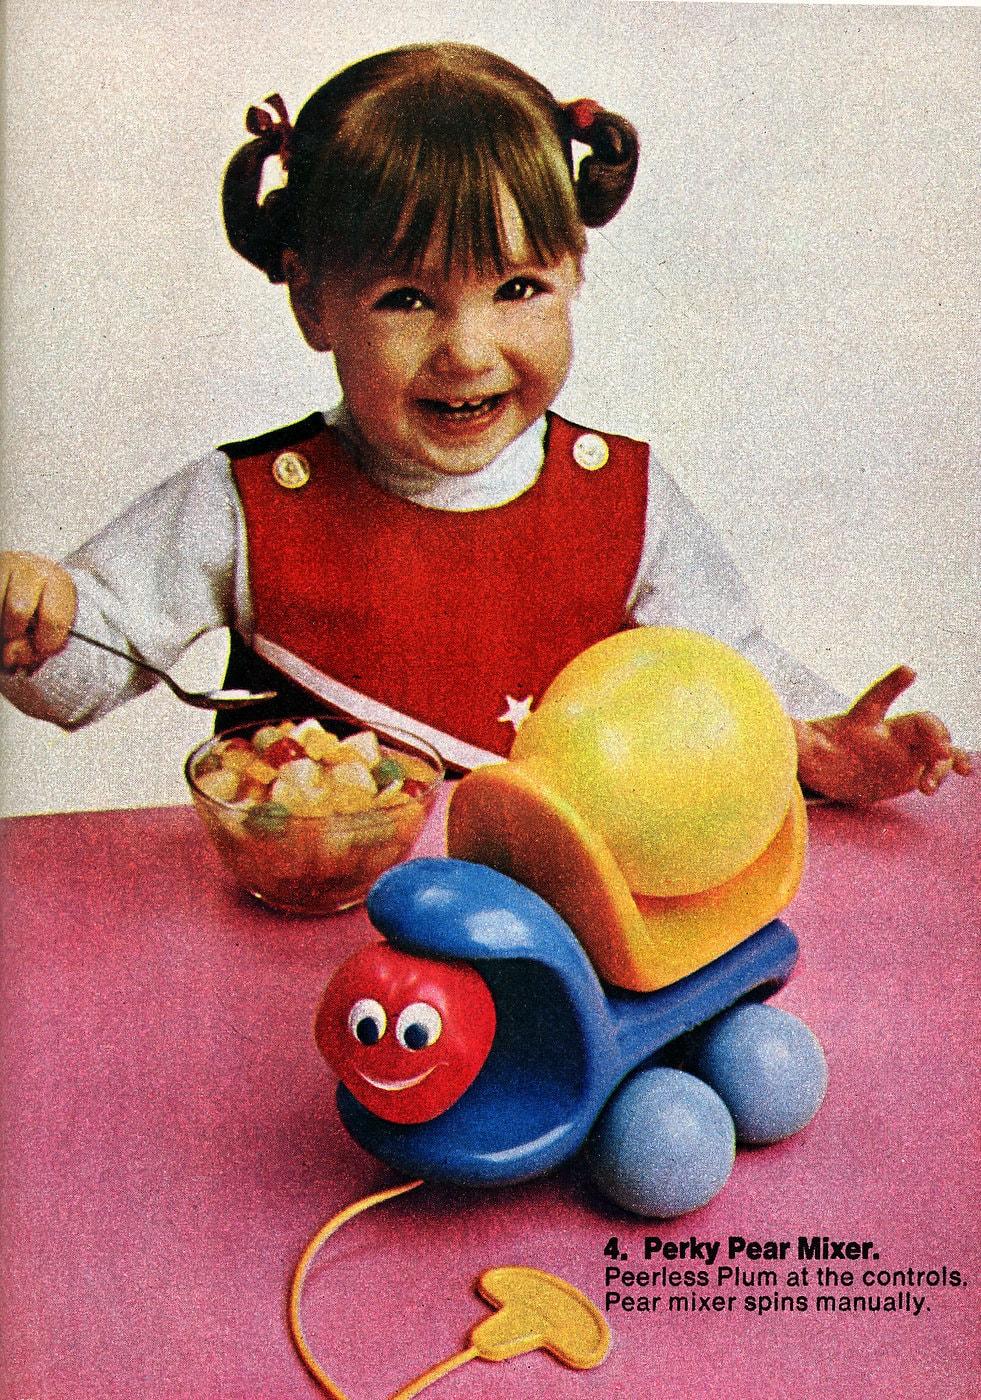 Vintage Tonka Toddler toys - Perky Pear Mixer (1972)